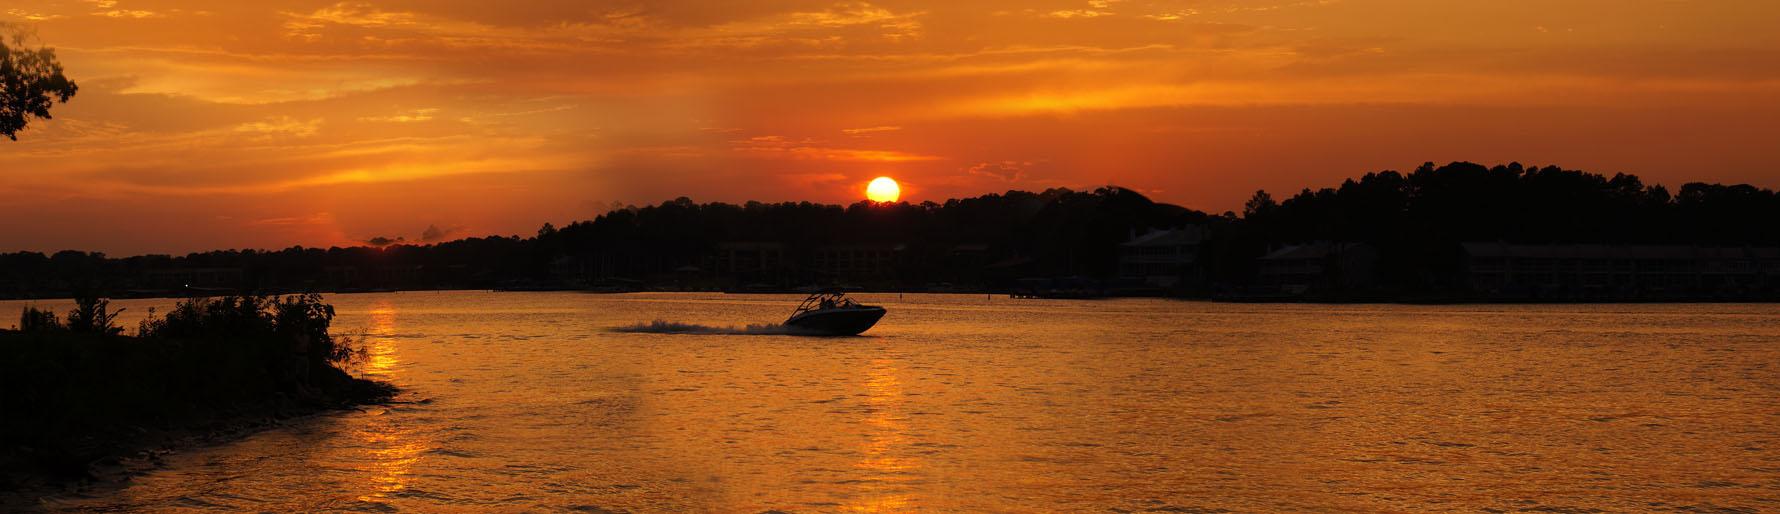 sunset_Lake_Conroe